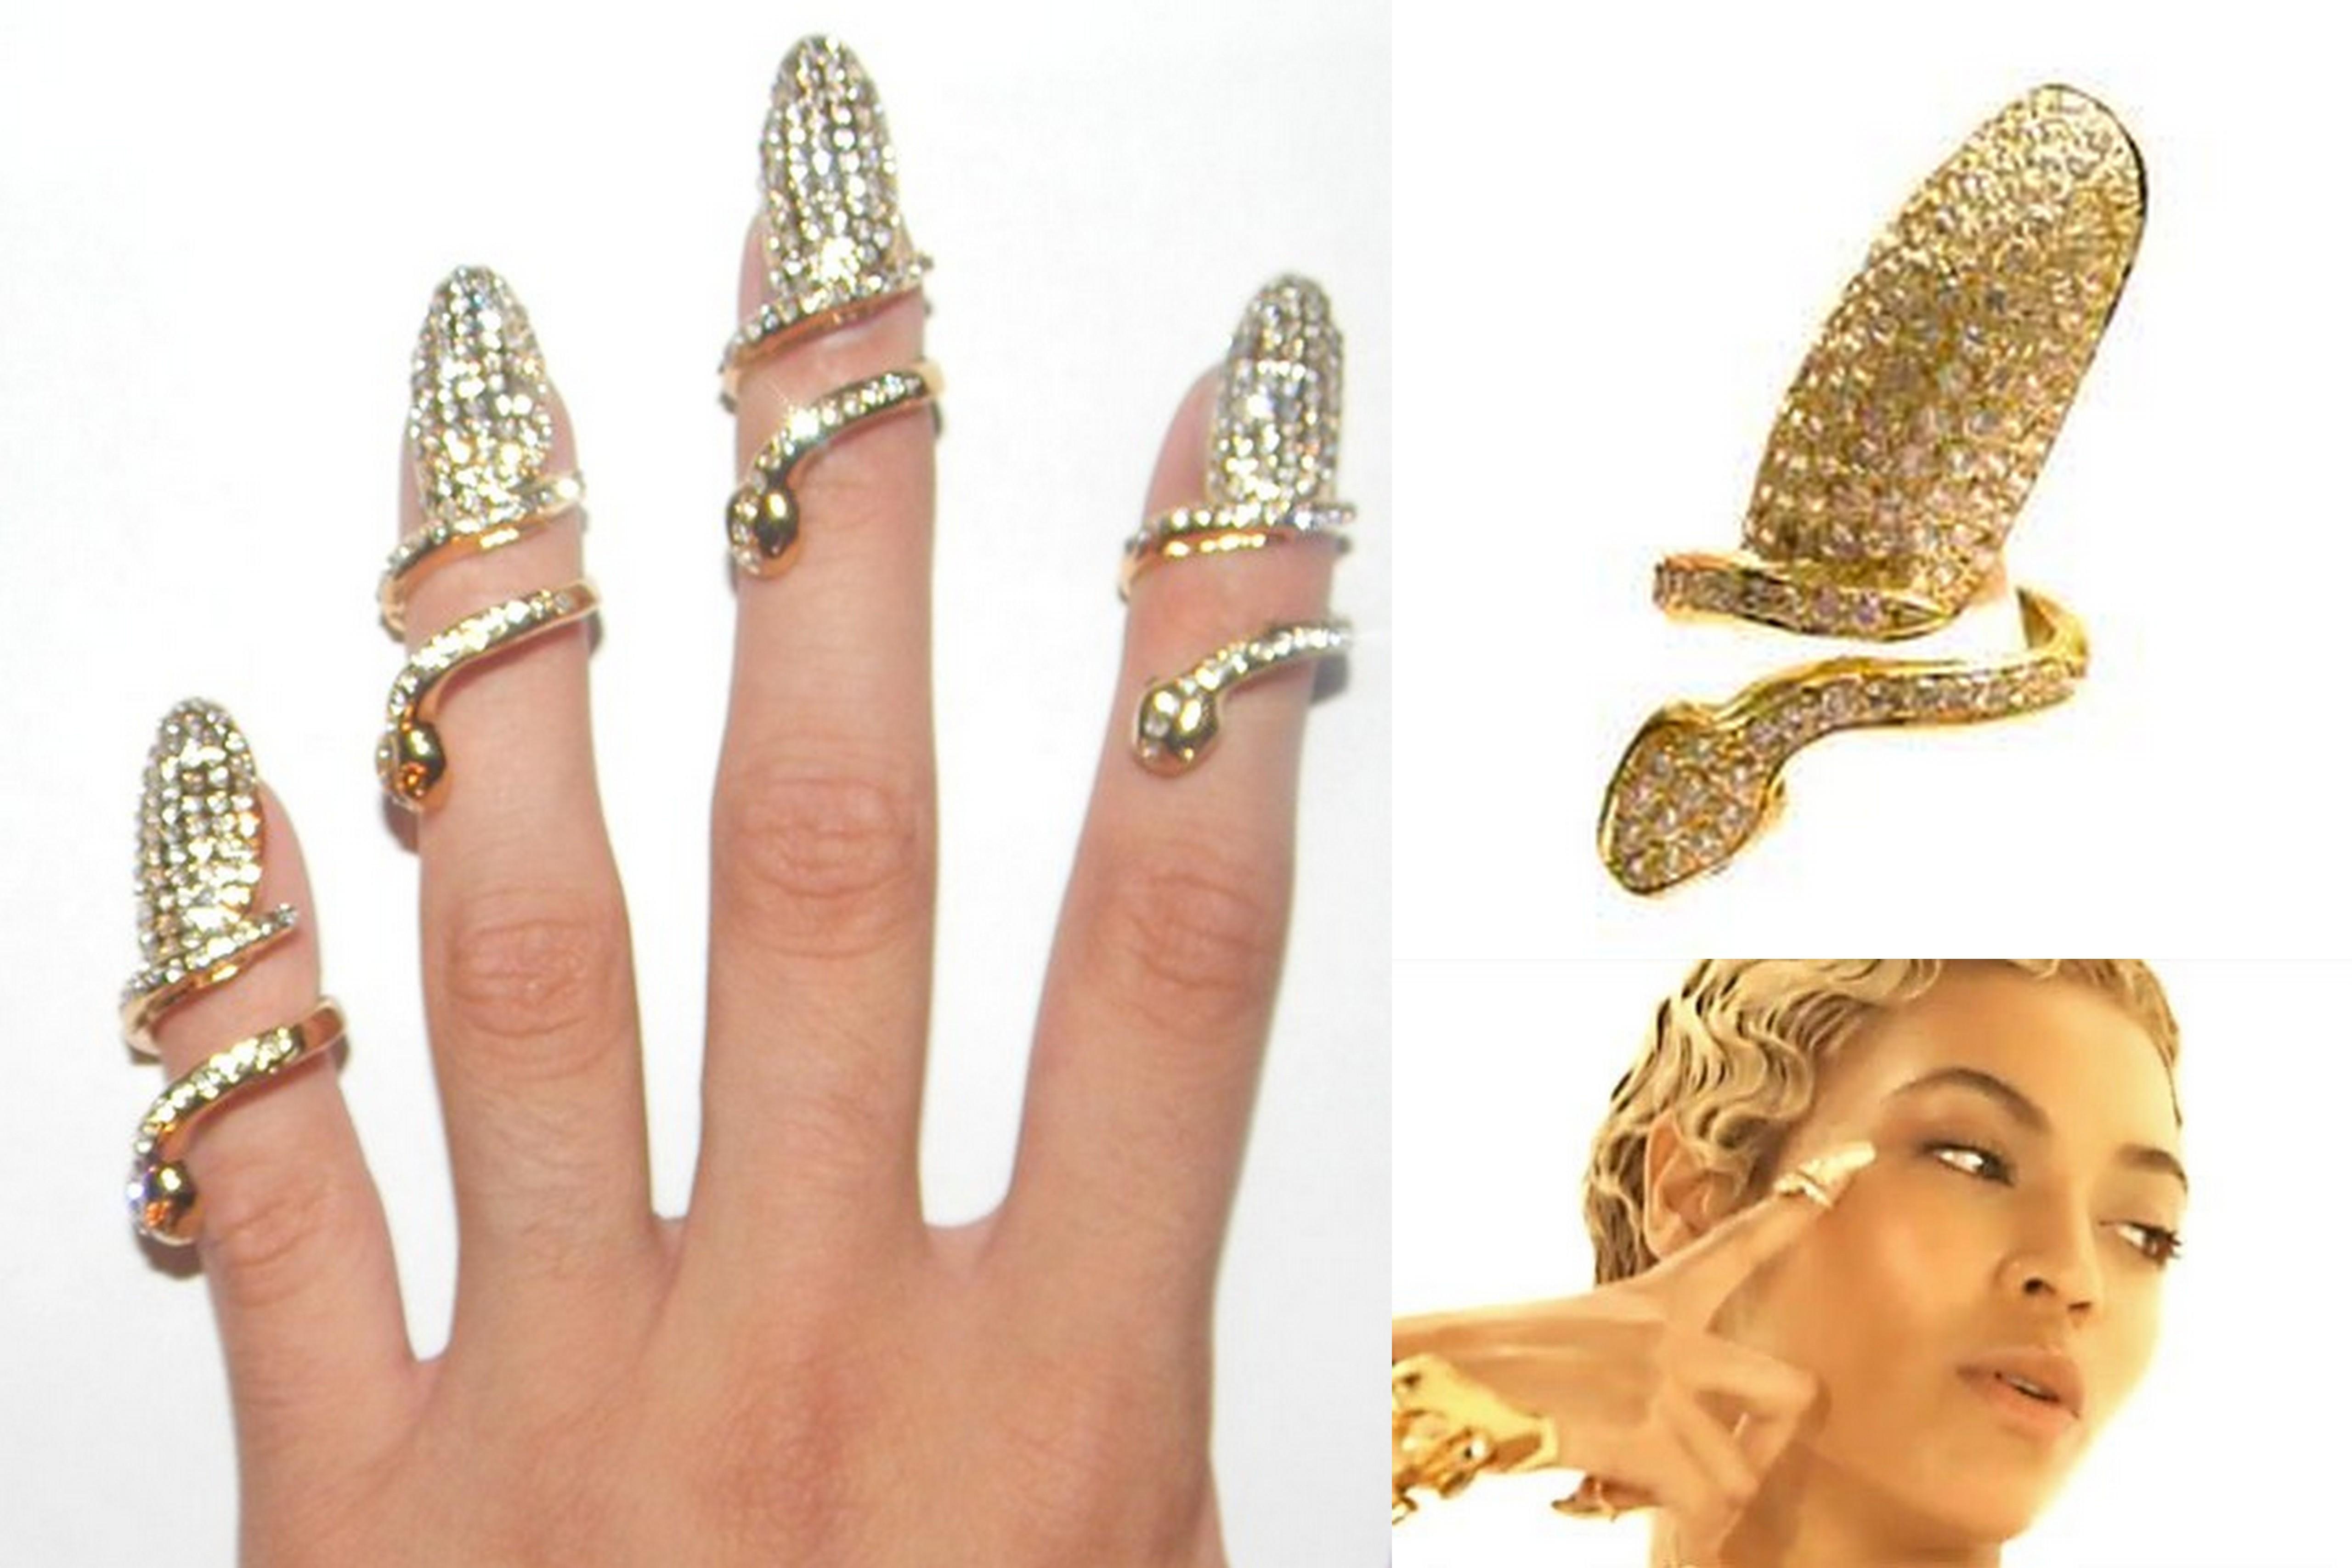 ANILLOS DE UÑAS (Nails Rings)